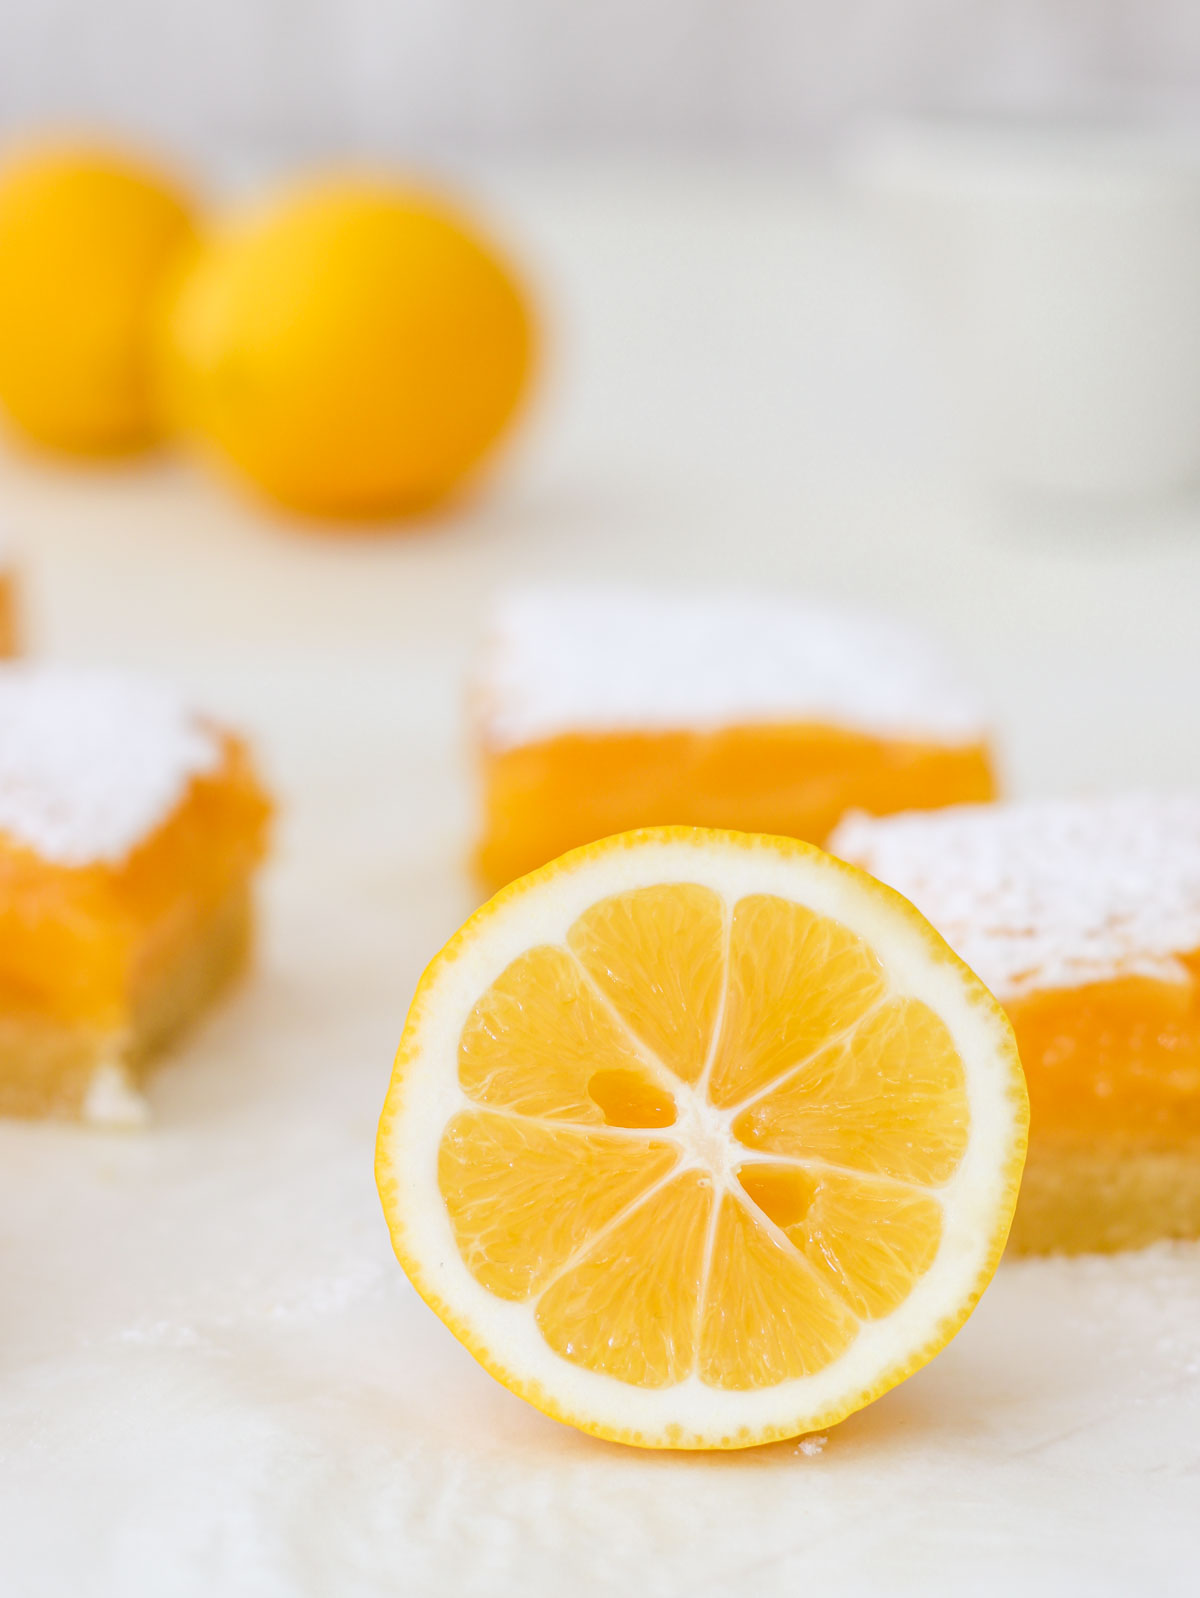 A lemon cut in half